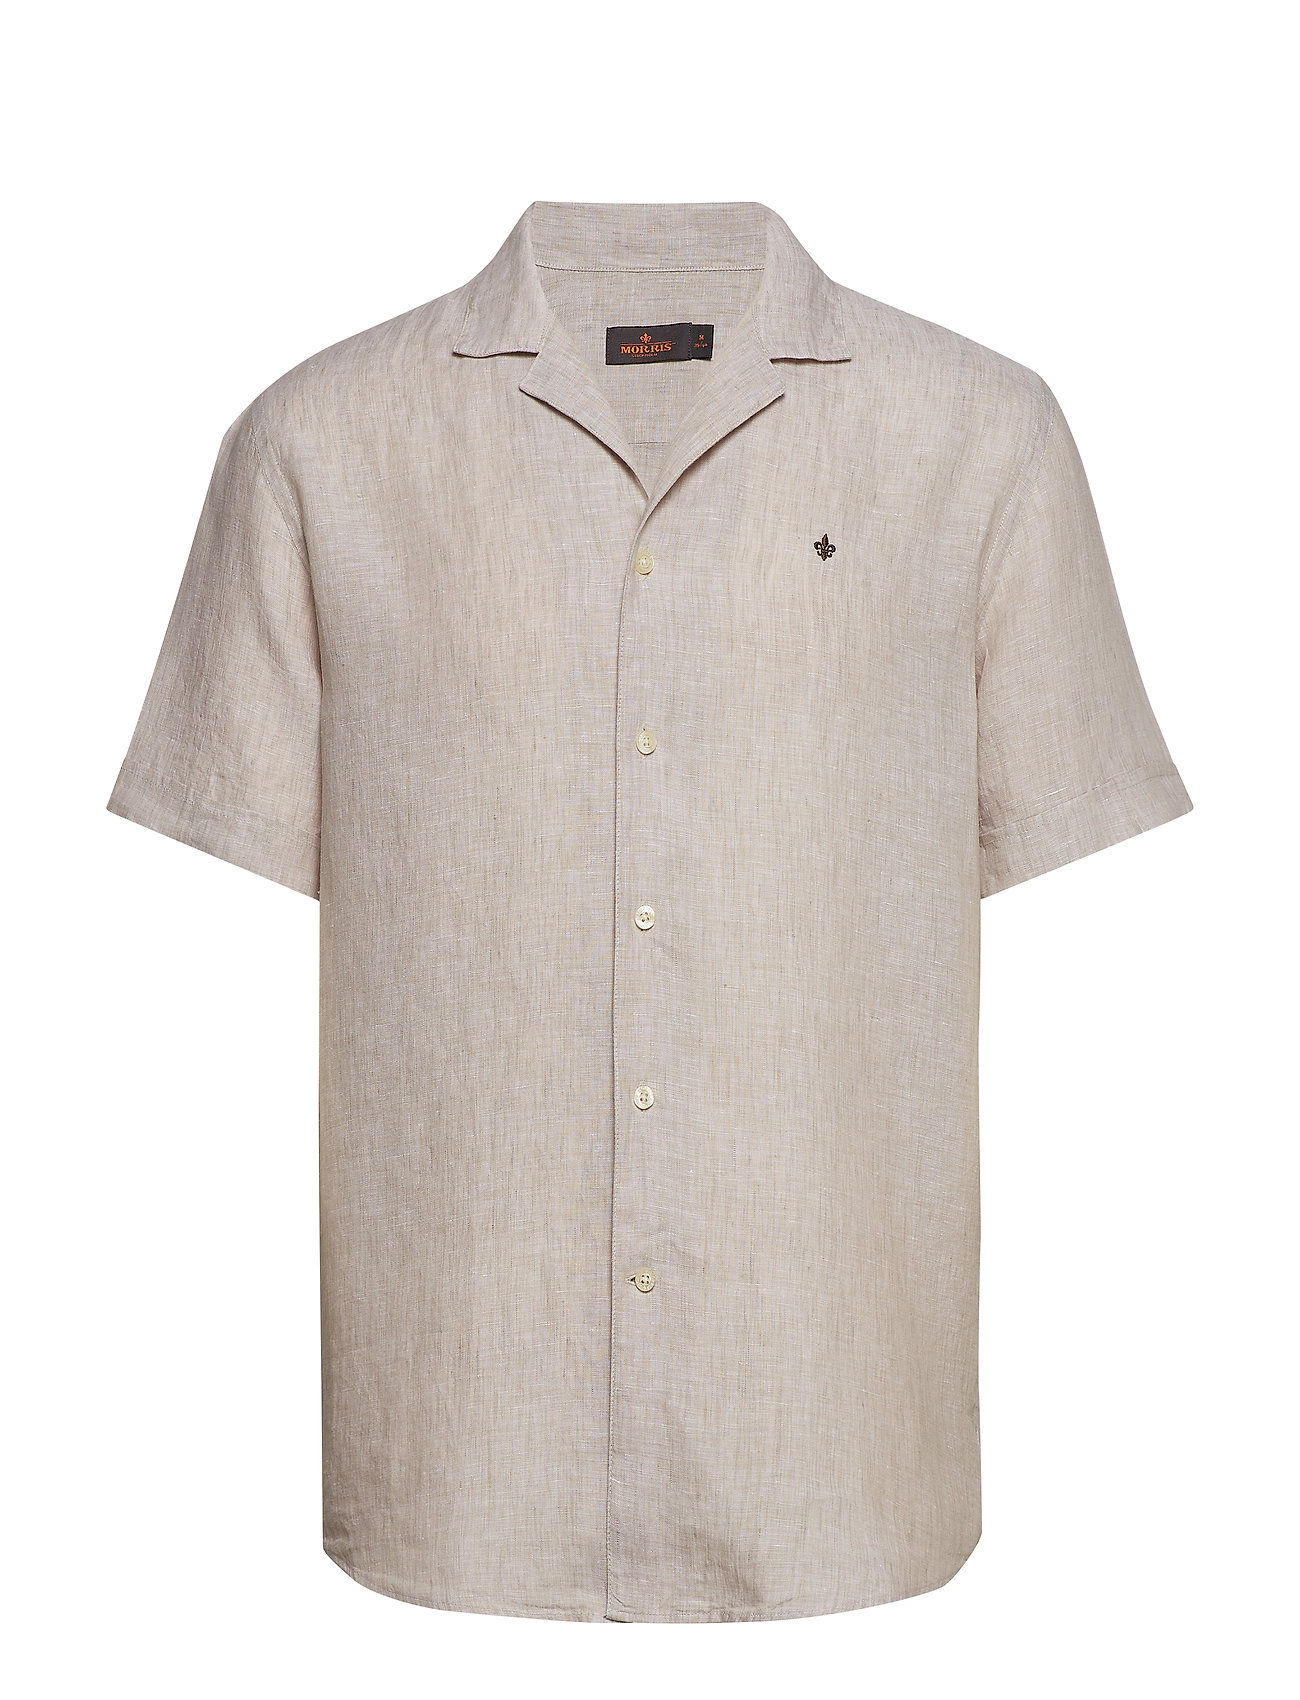 Morris Harper Bowling Linen Shirt - OLIVE